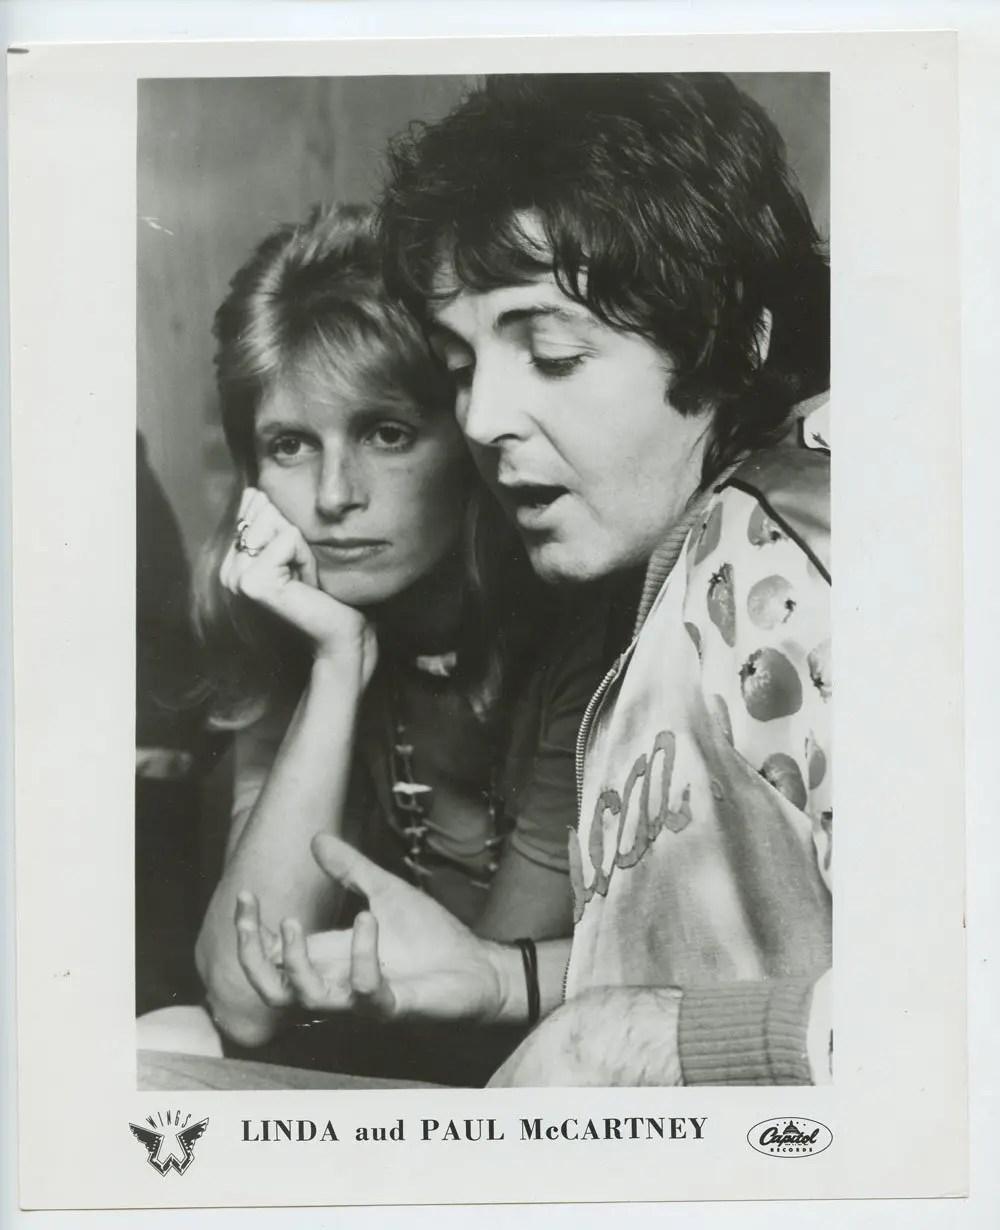 Paul McCartney and Linda Photo 1971 Publicity Promo Capital Records